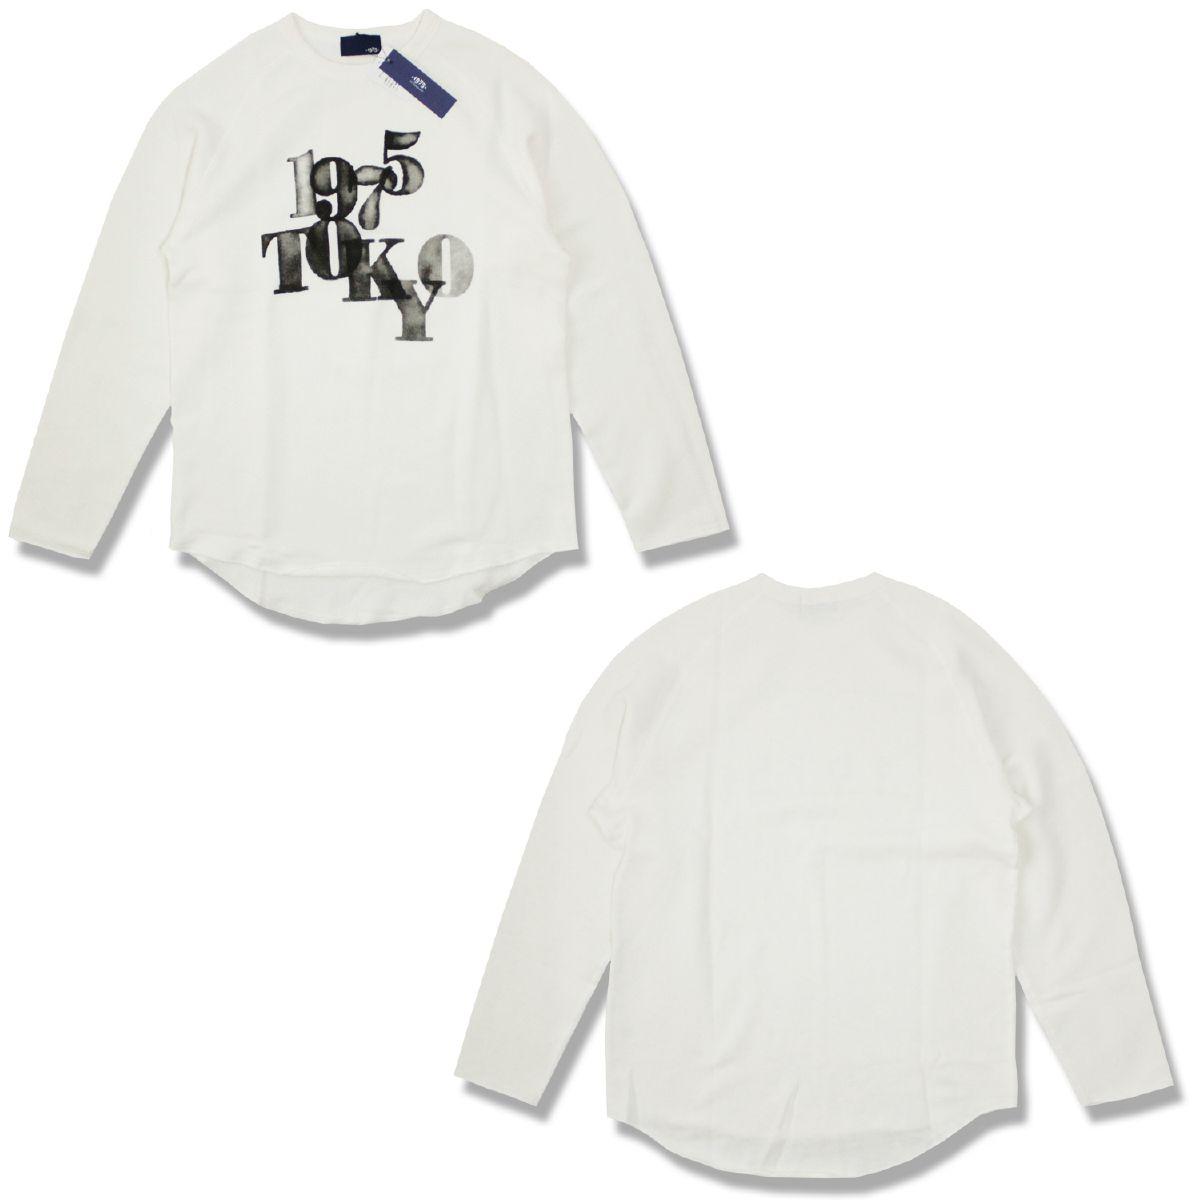 【50%OFF】1975 TOKYO 1975トーキョー MESHPRINT ROUND SWEAT